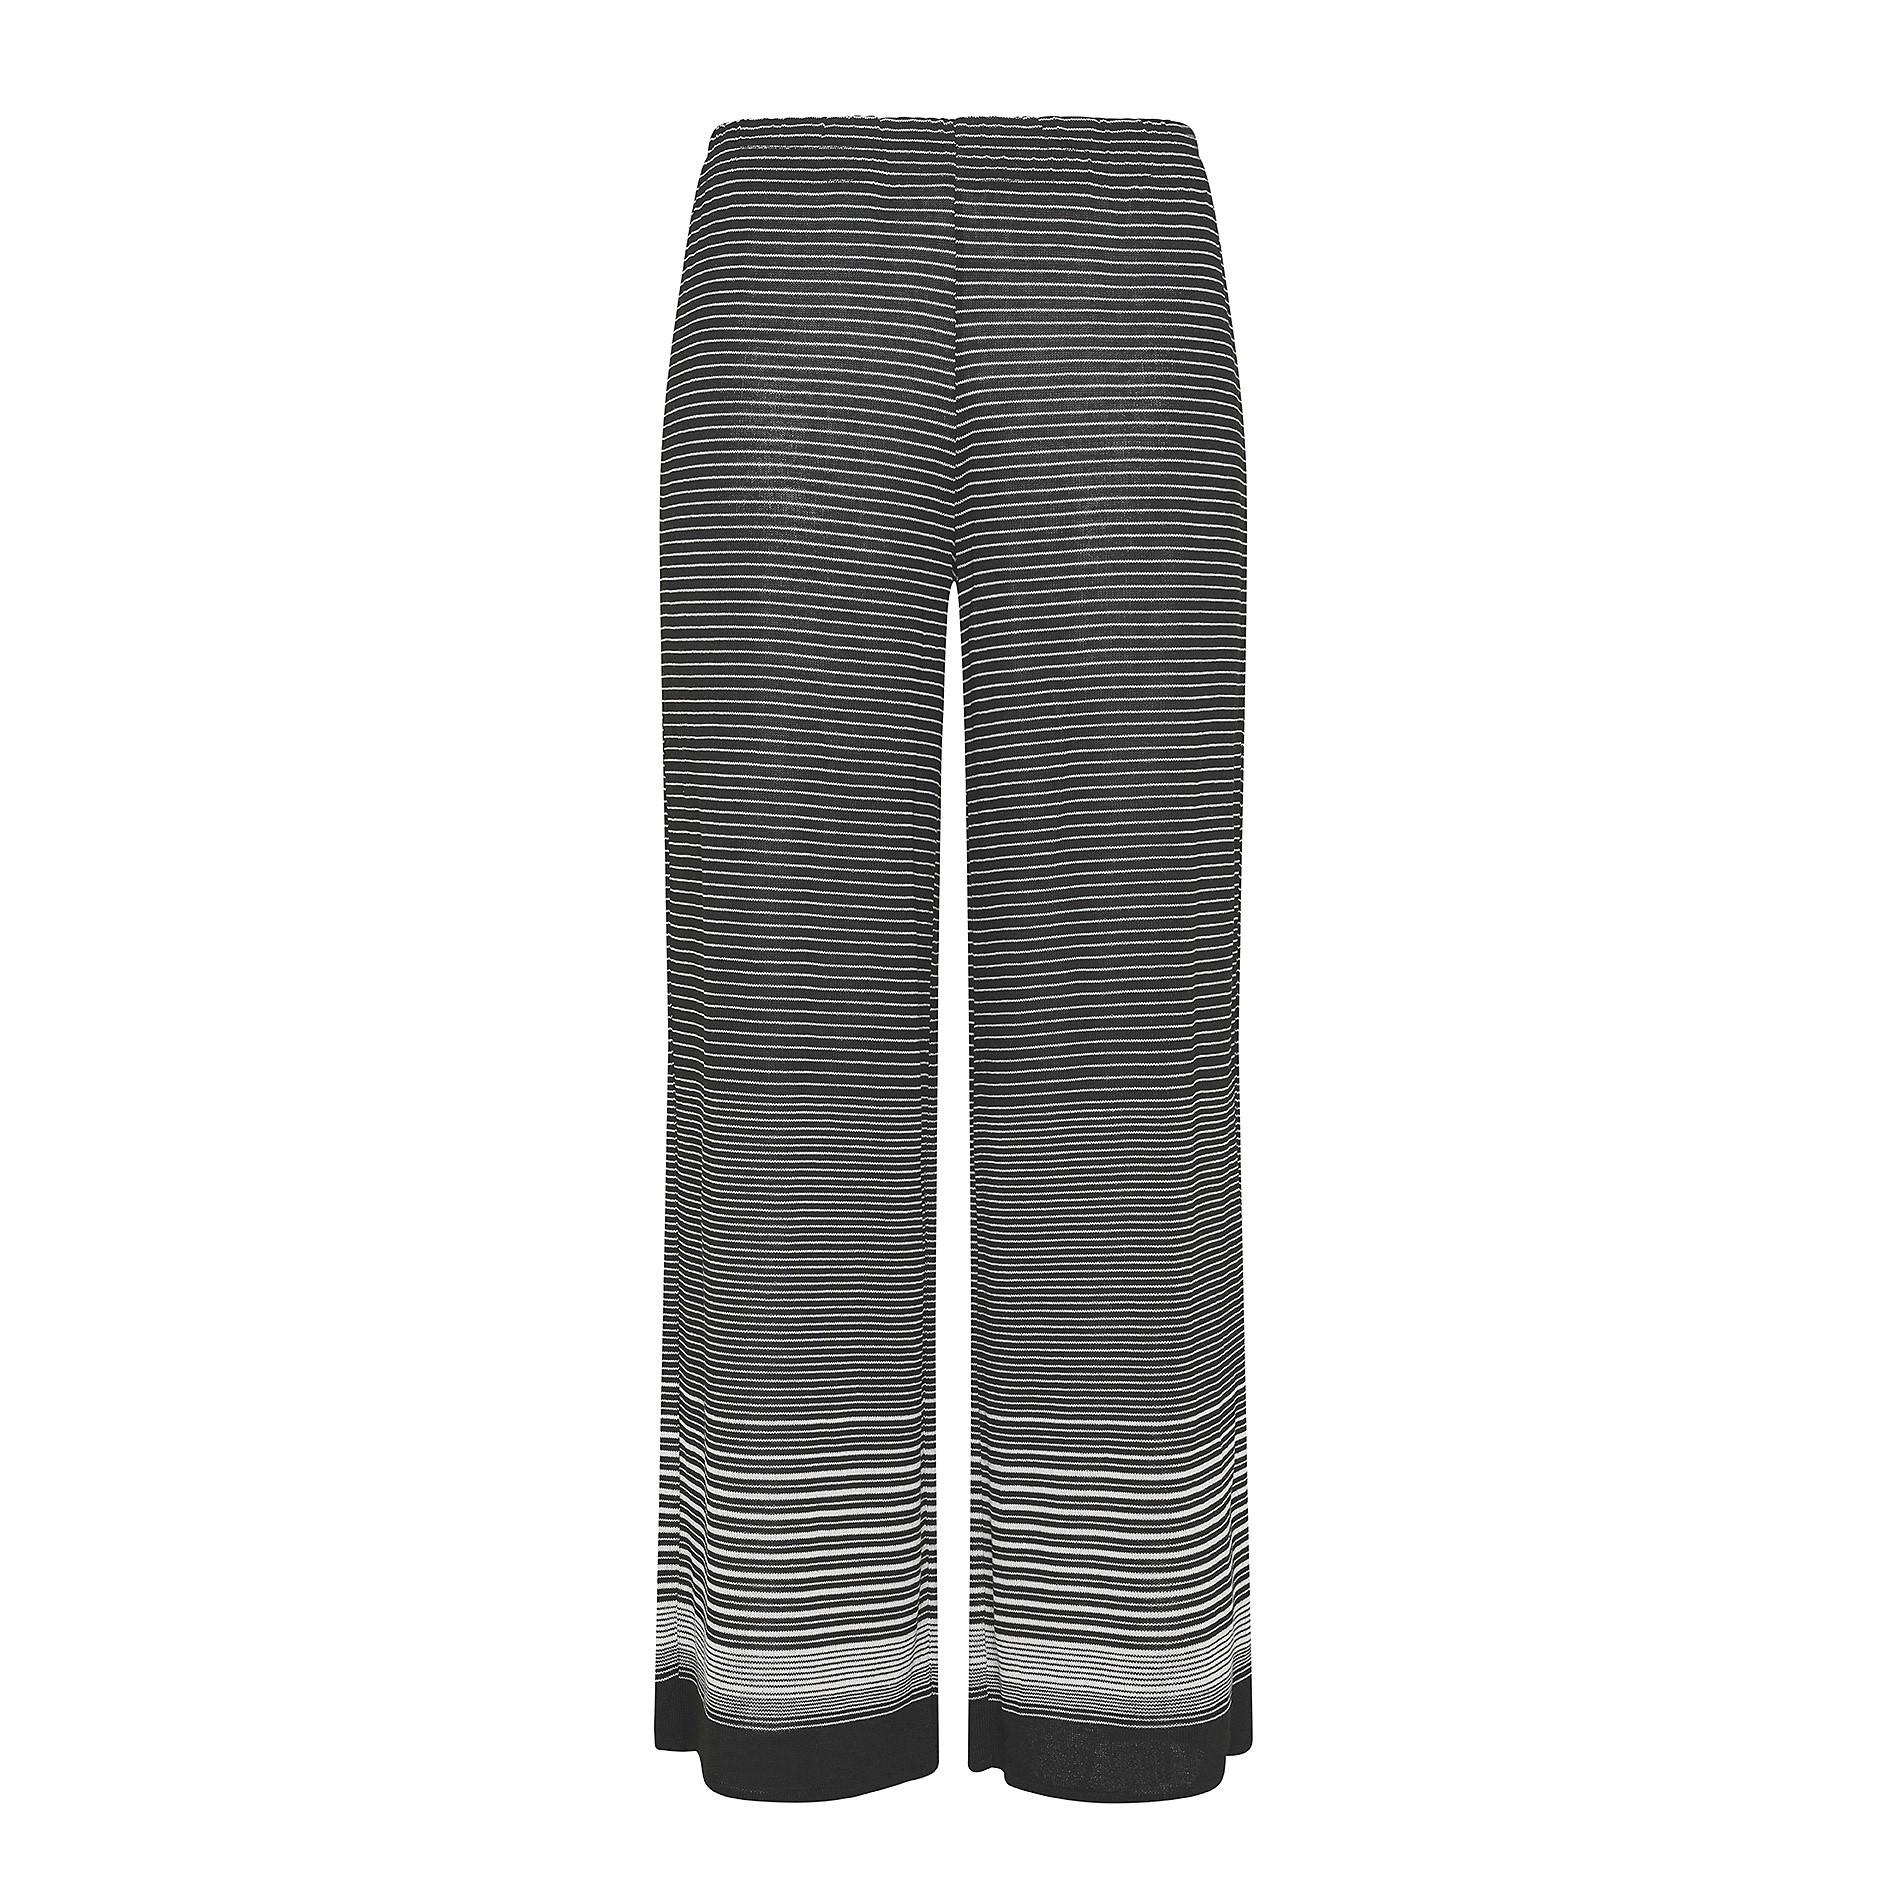 Pantalone ampio leggero a righe Koan, Nero, large image number 0